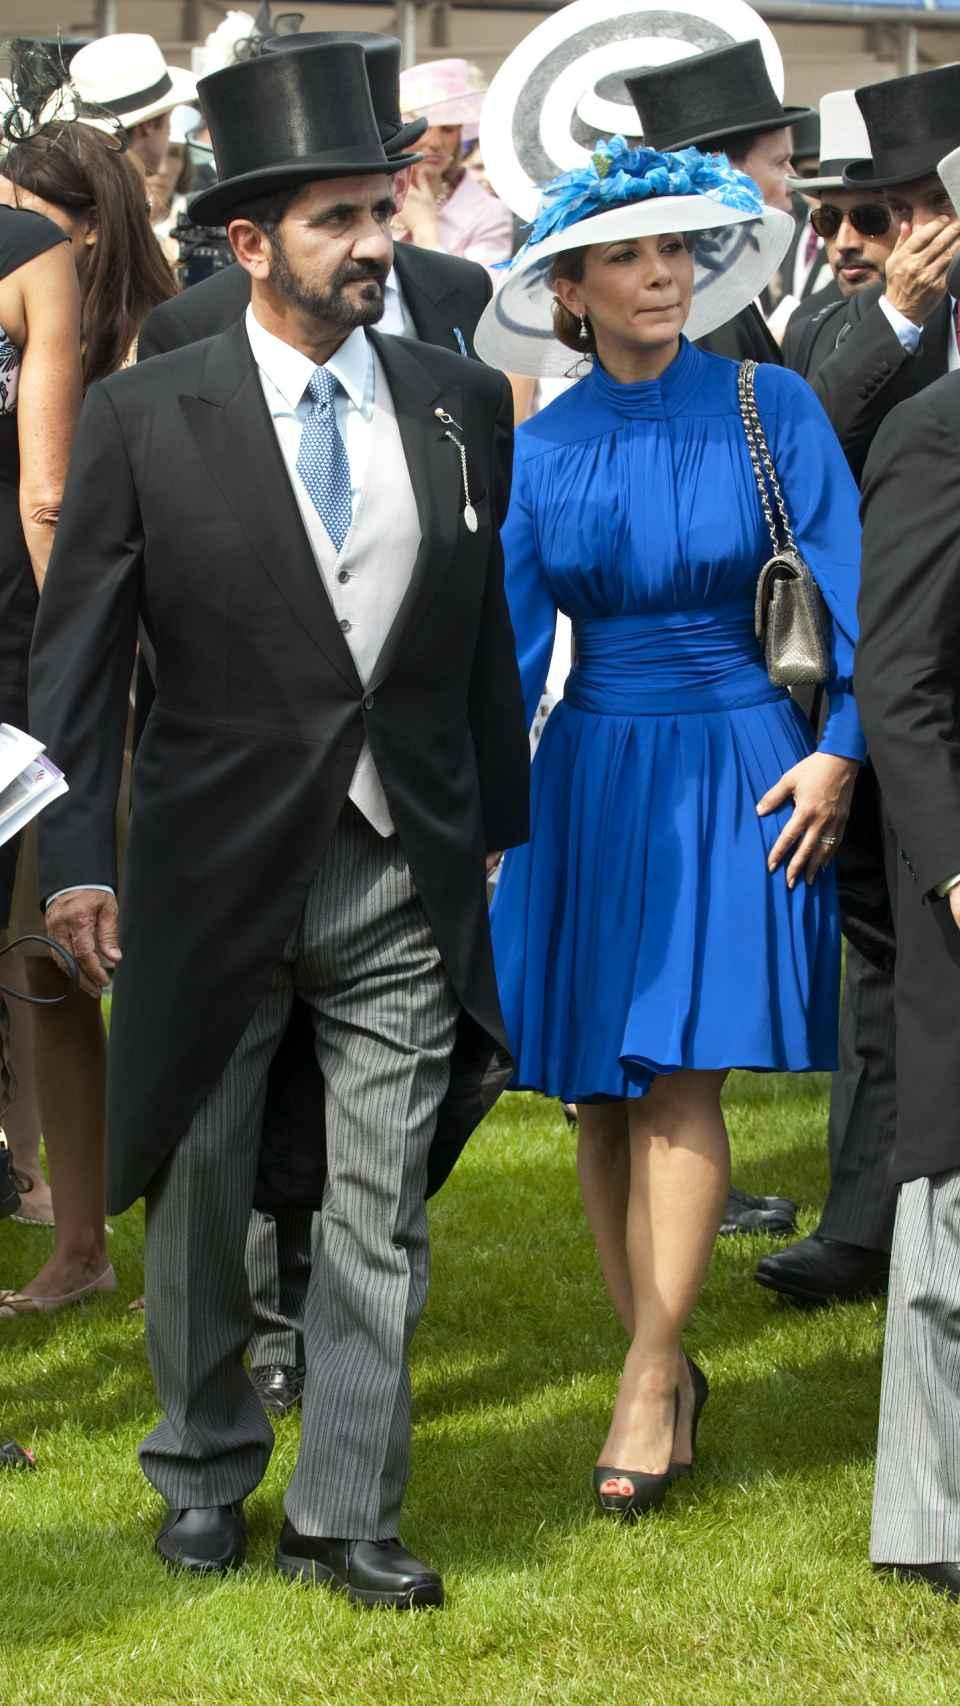 La princesa Haya de Jordania y su marido, Mohamed bin Rashid Al Maktum, en Ascot.